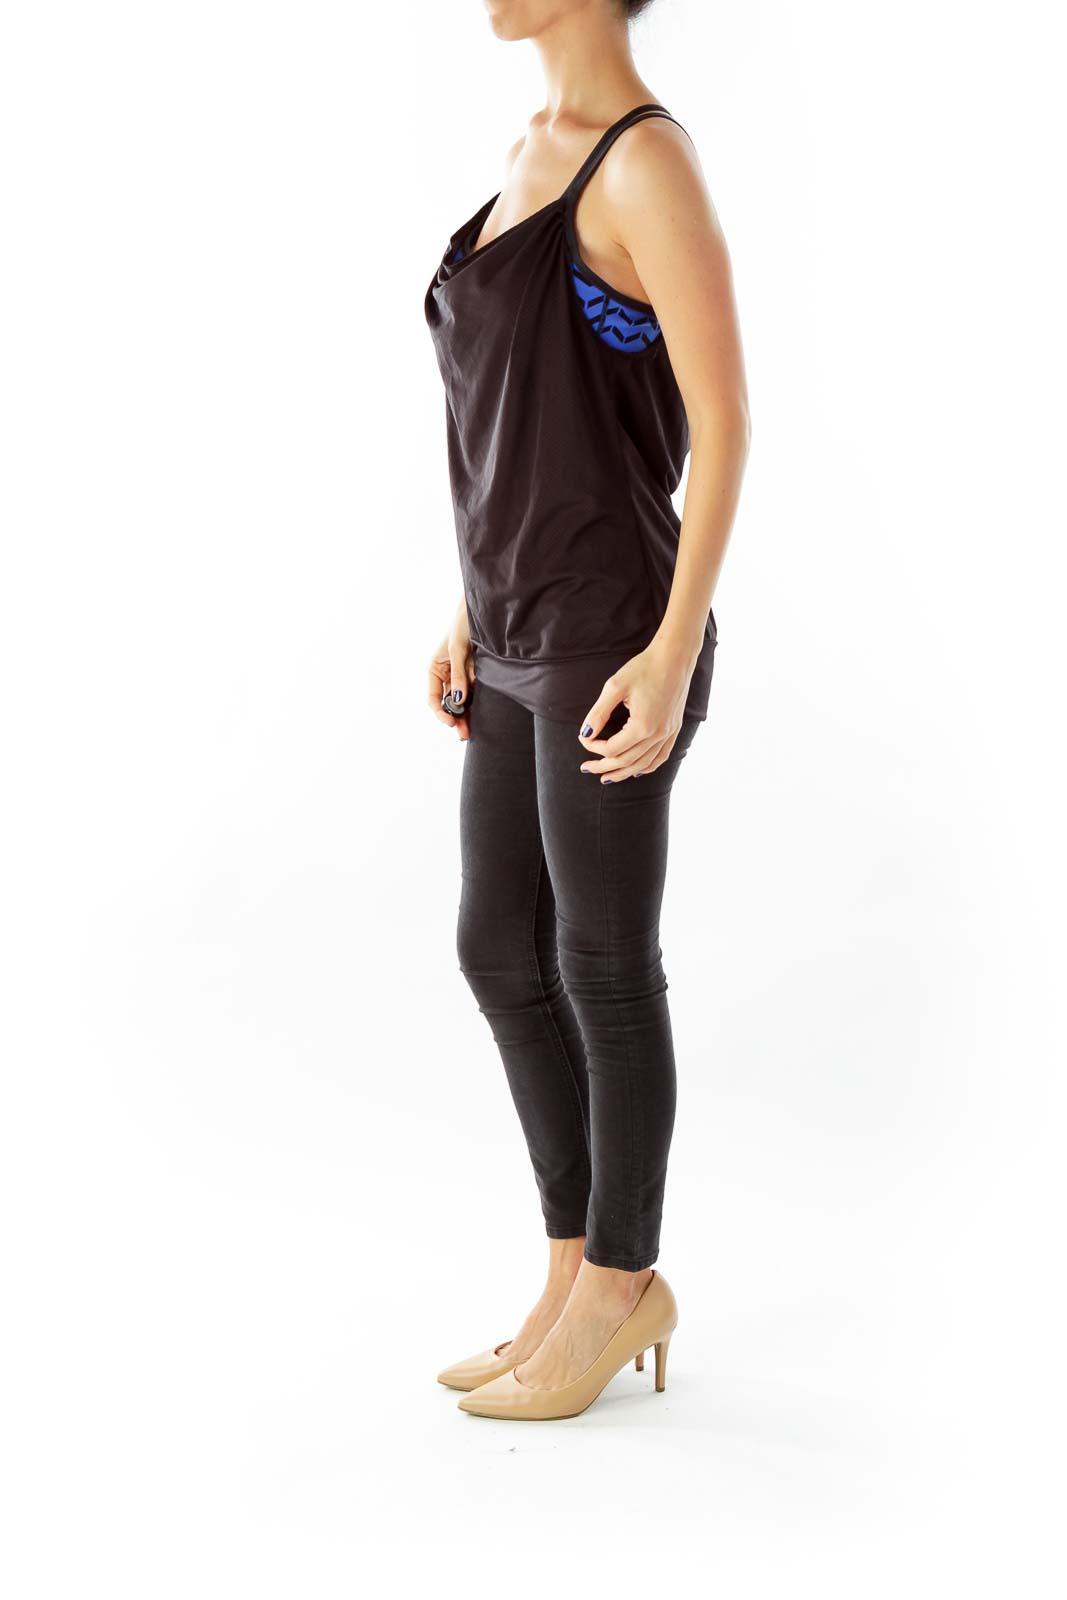 Black Racerback Yoga Top with Bralet